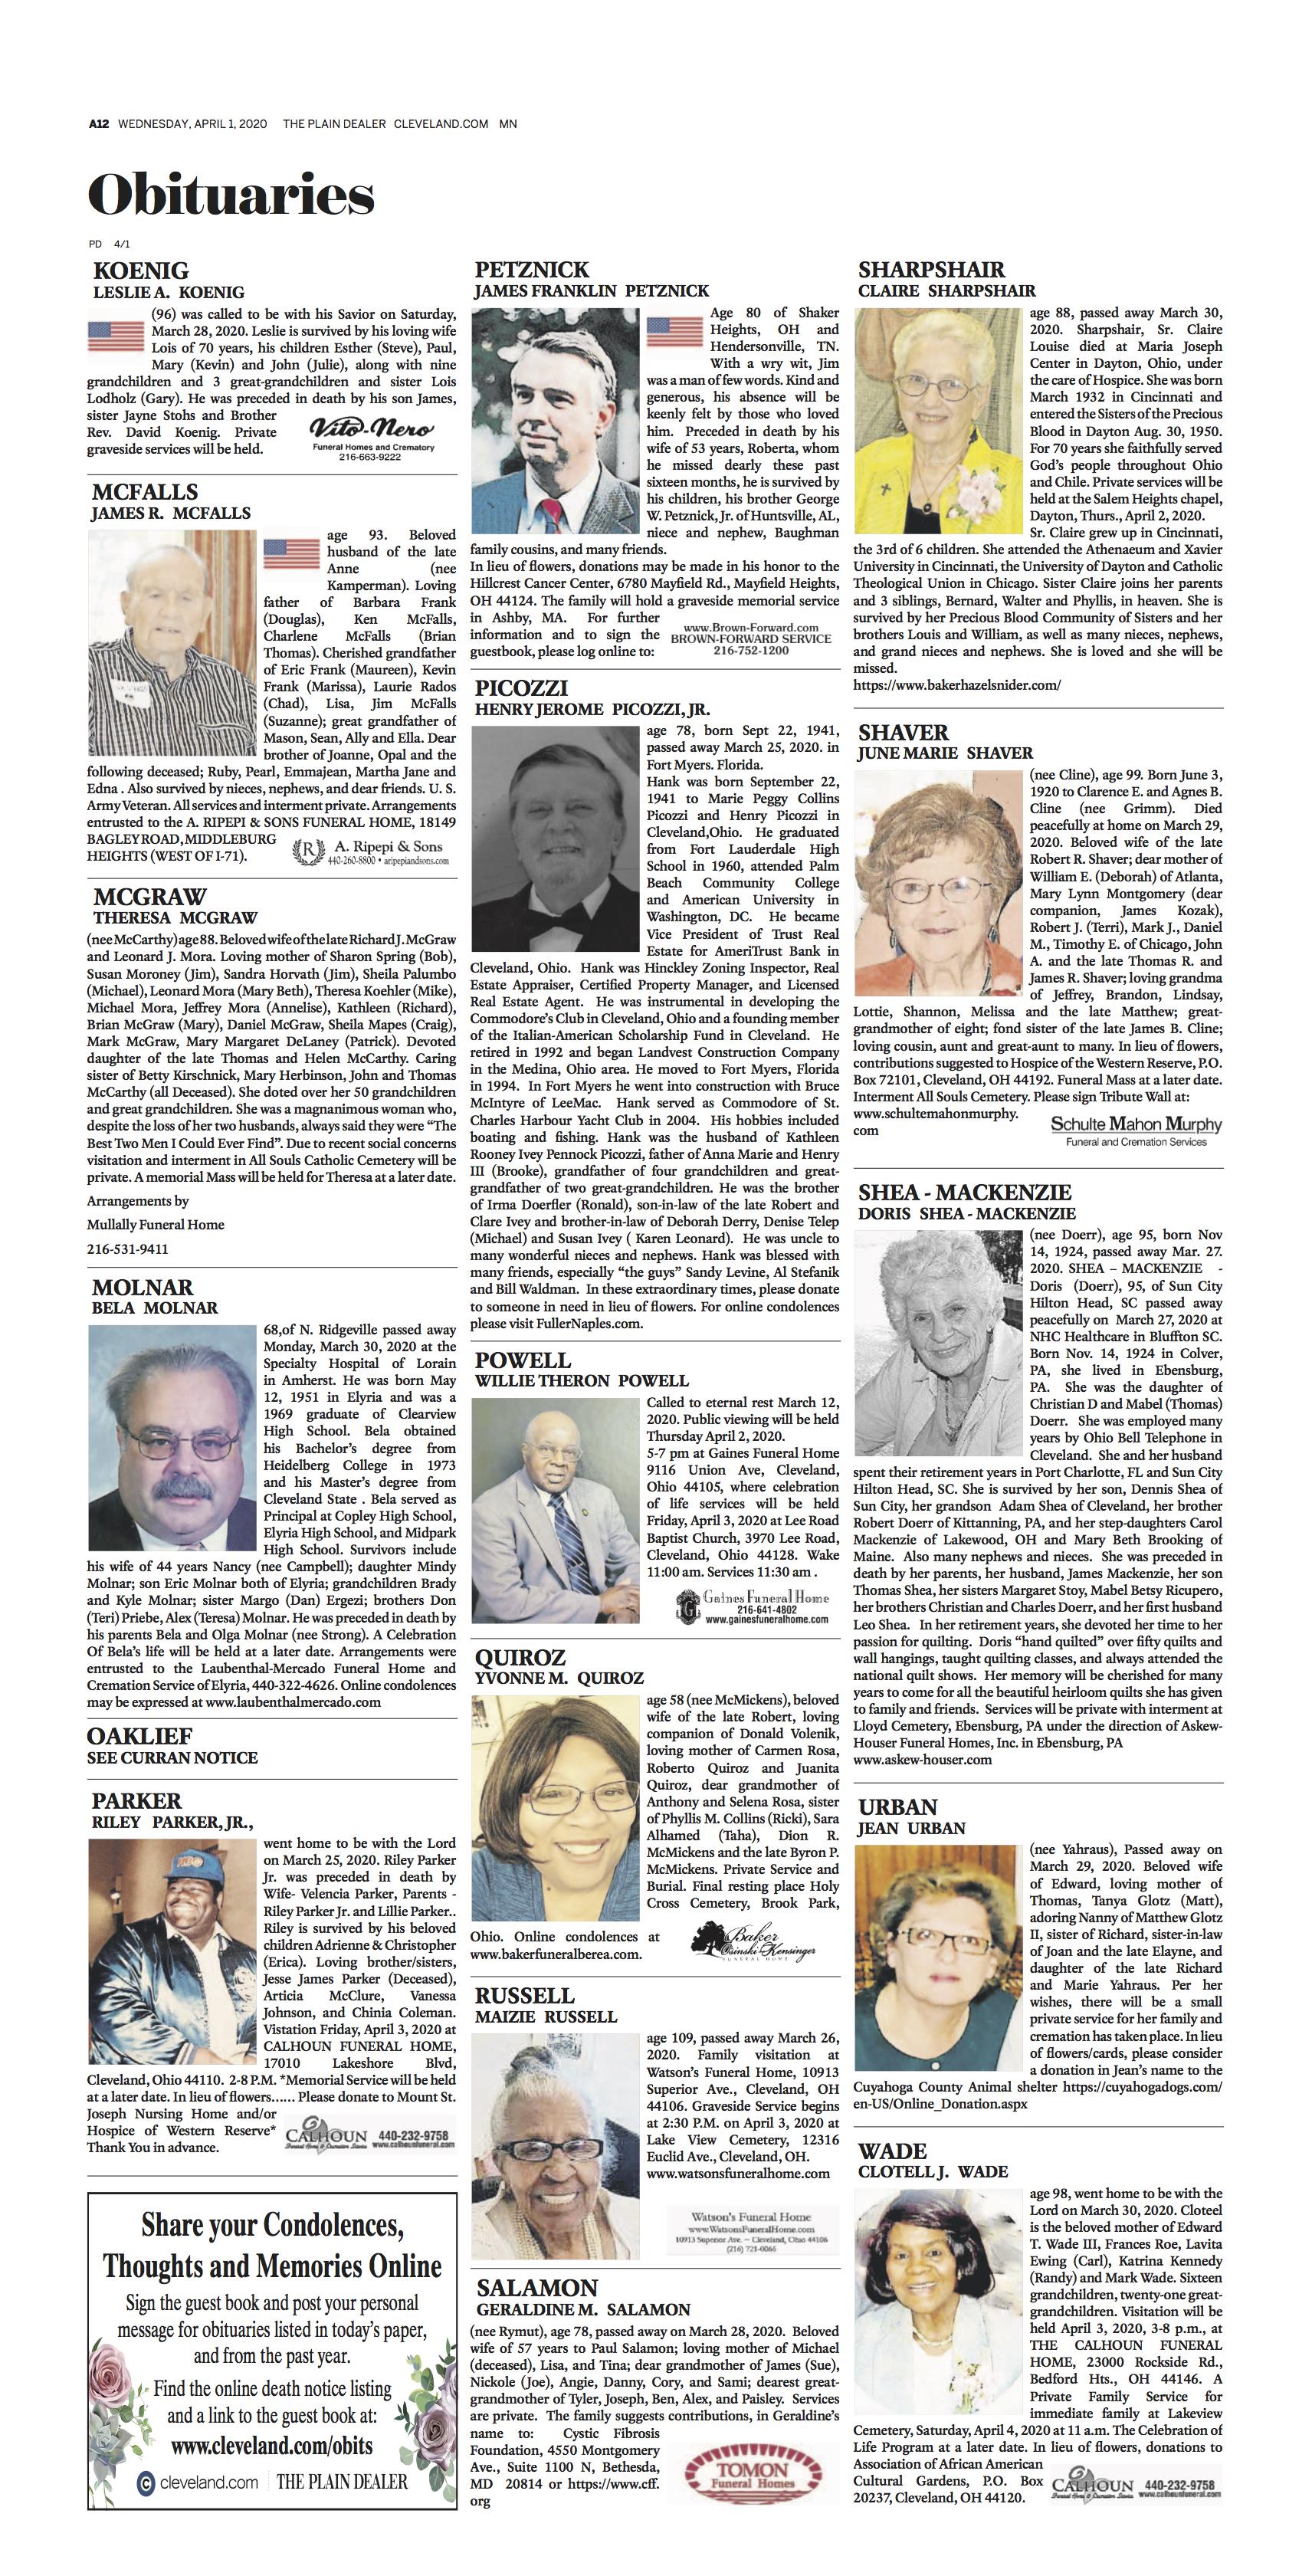 New Plain Dealer Obituaries Larger In Color And Easier To Read Tim Warsinskey Cleveland Com